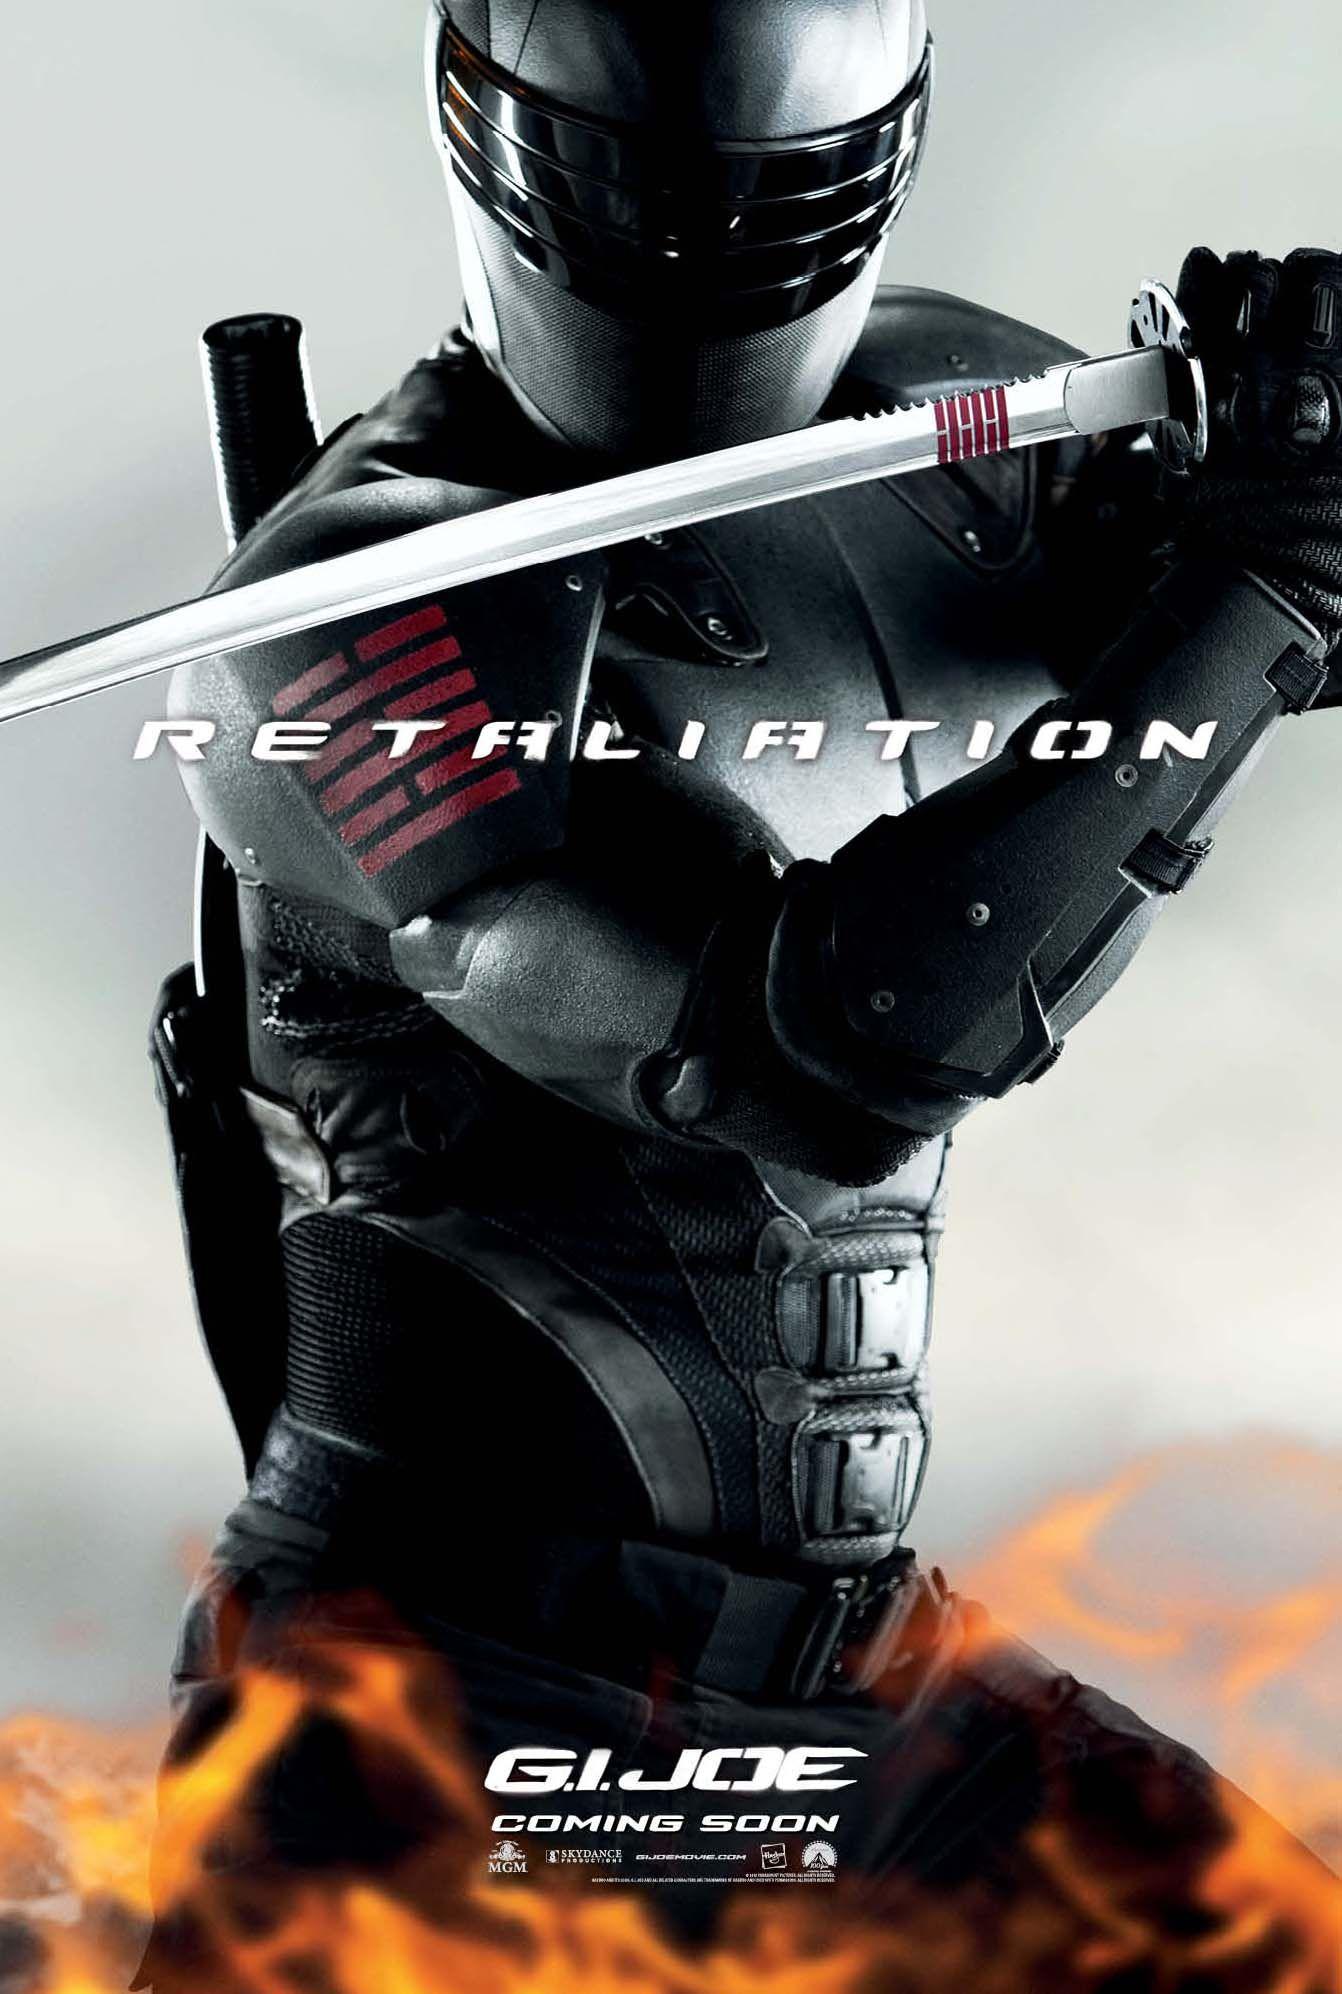 G.I. JOE 2 Character Posters | Collider Gi Joe Retaliation Character Poster